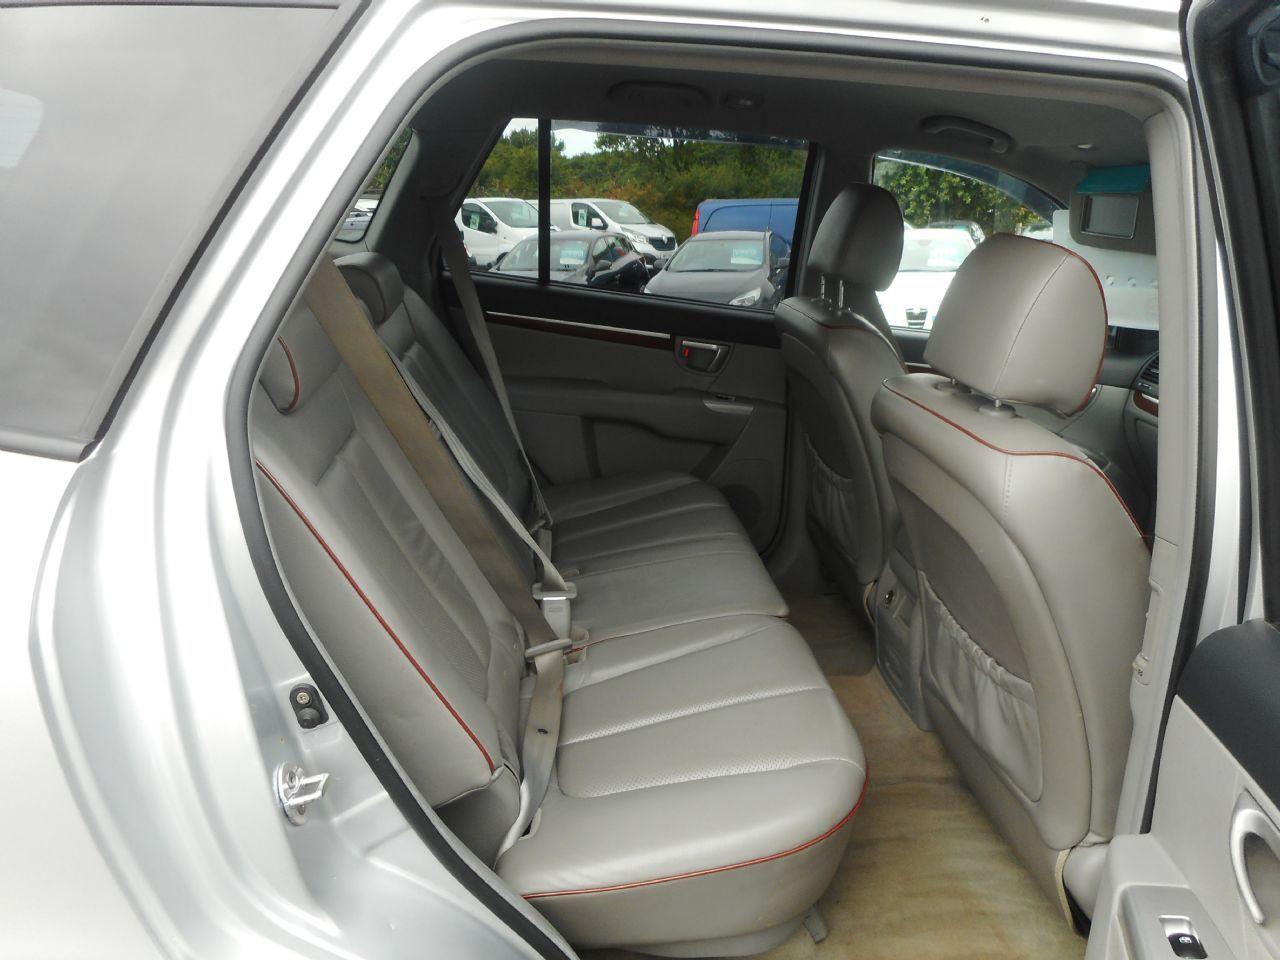 HYUNDAI Santa Fe 2.2 CRTD CDX 5 Seat EU4 (2008) - Picture 8